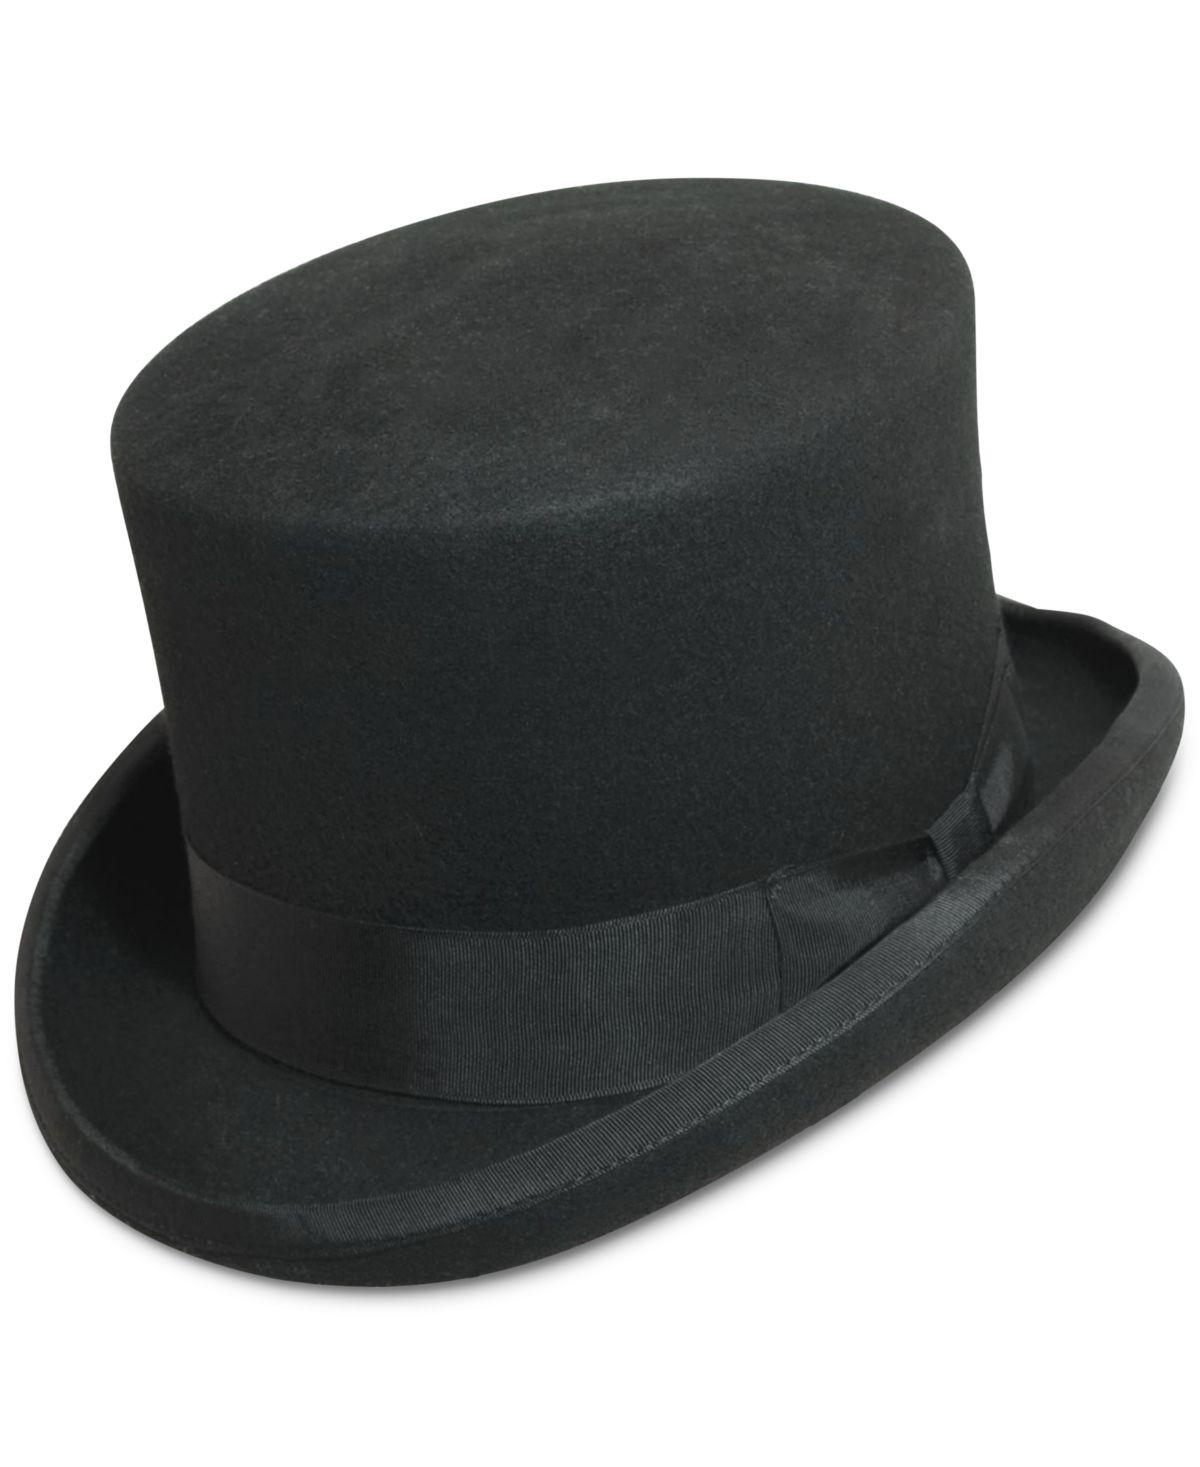 Scala Men S English Top Hat Reviews Hats Gloves Scarves Men Macy S In 2021 Top Hat Hats For Men Top Hats For Women